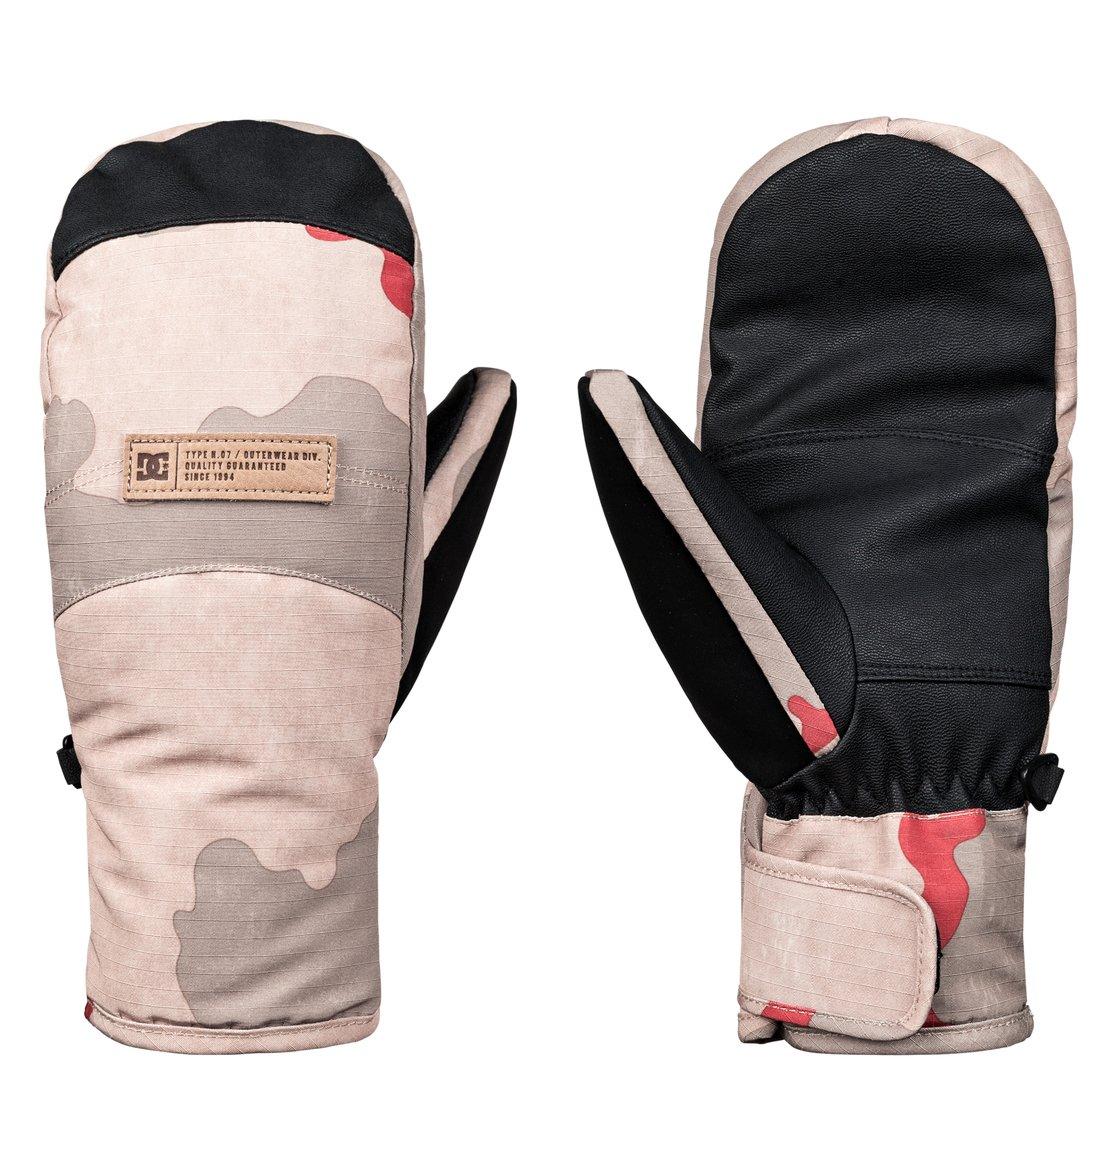 DC Schuhes™ Franchise Ski/Snowboard - Ski/Snowboard Franchise Mittens for Damens - Frauen f66b42